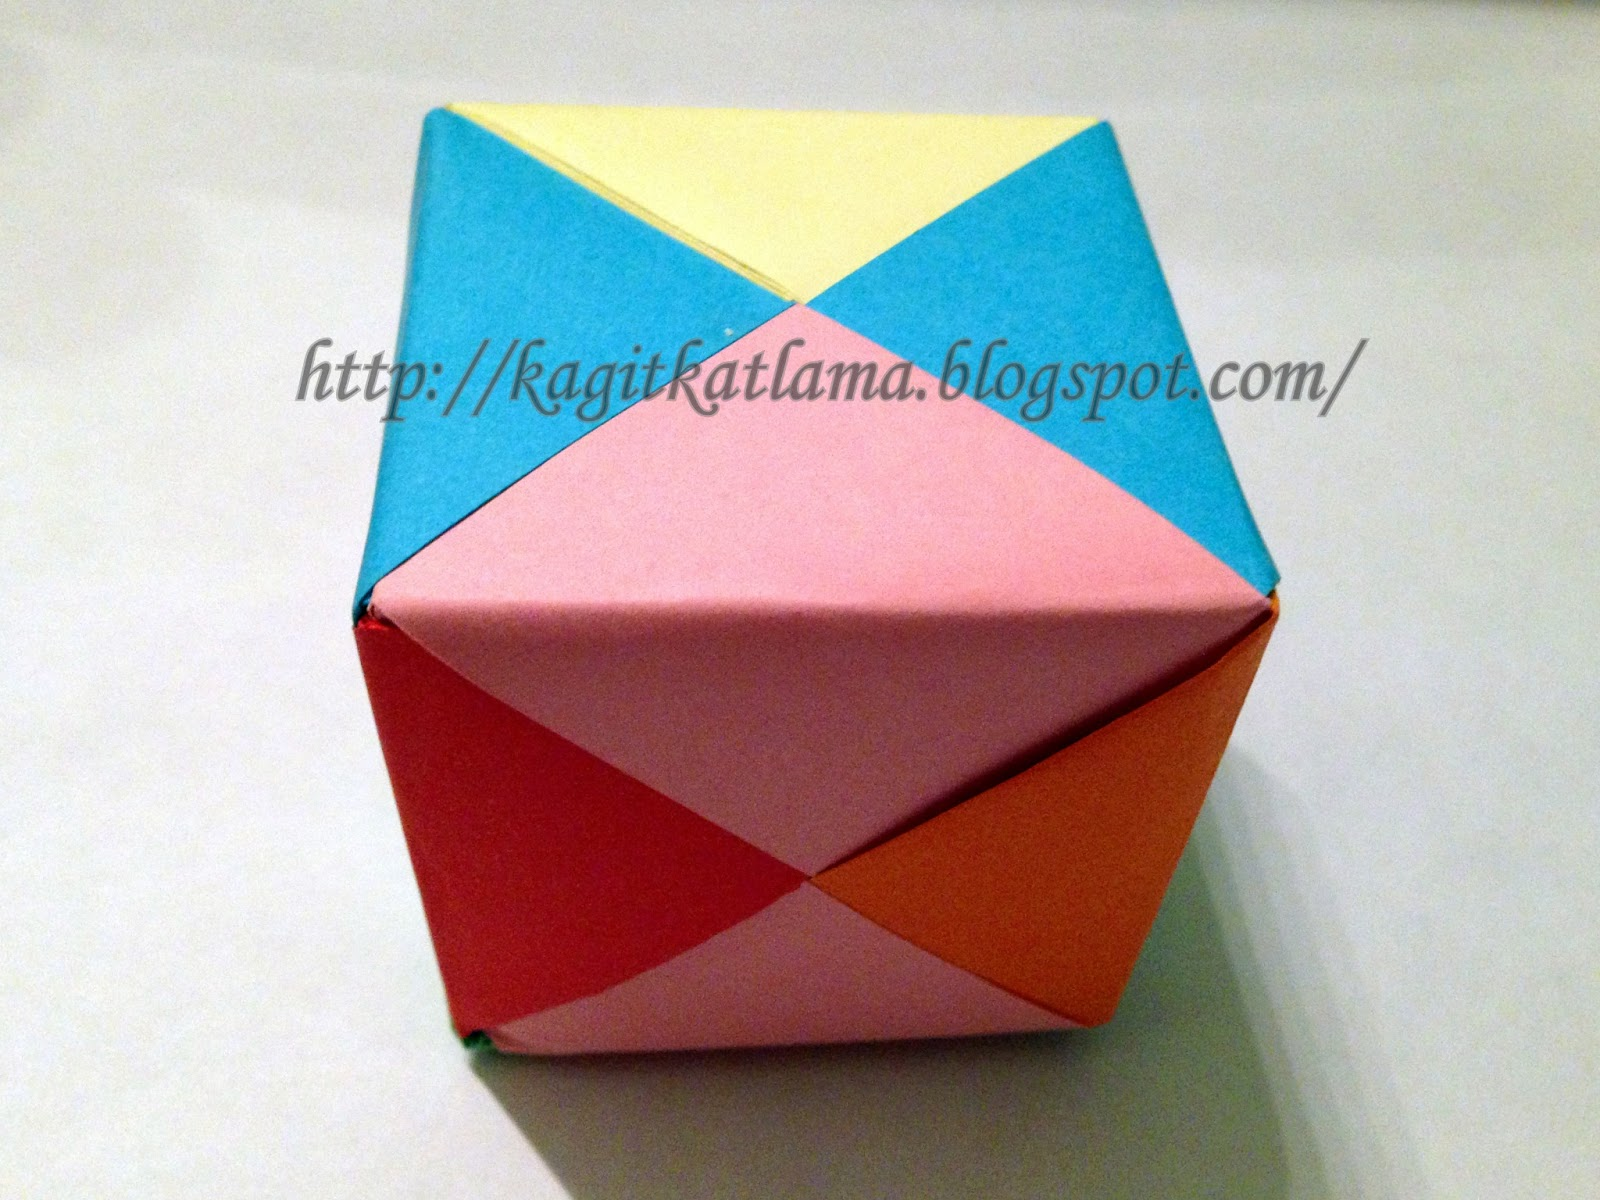 Kağıttan Dekoratif Top Süs Yapımı